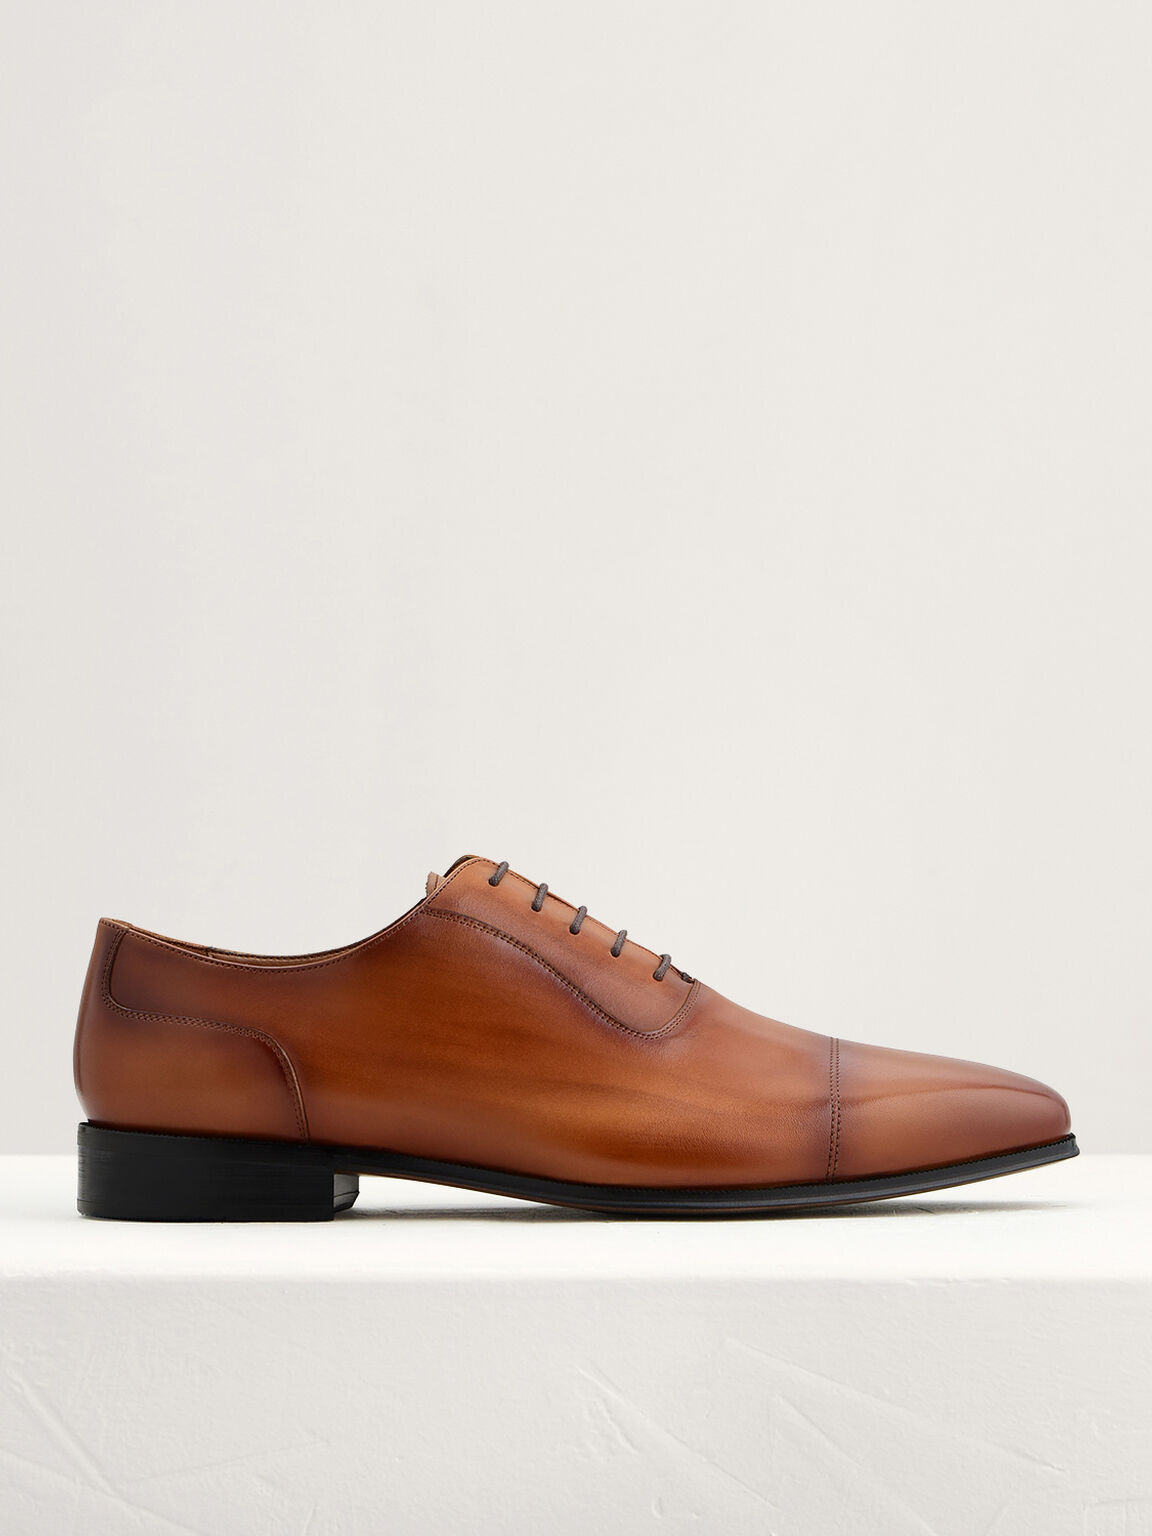 Leather Cap Toe Oxfords, Cognac, hi-res